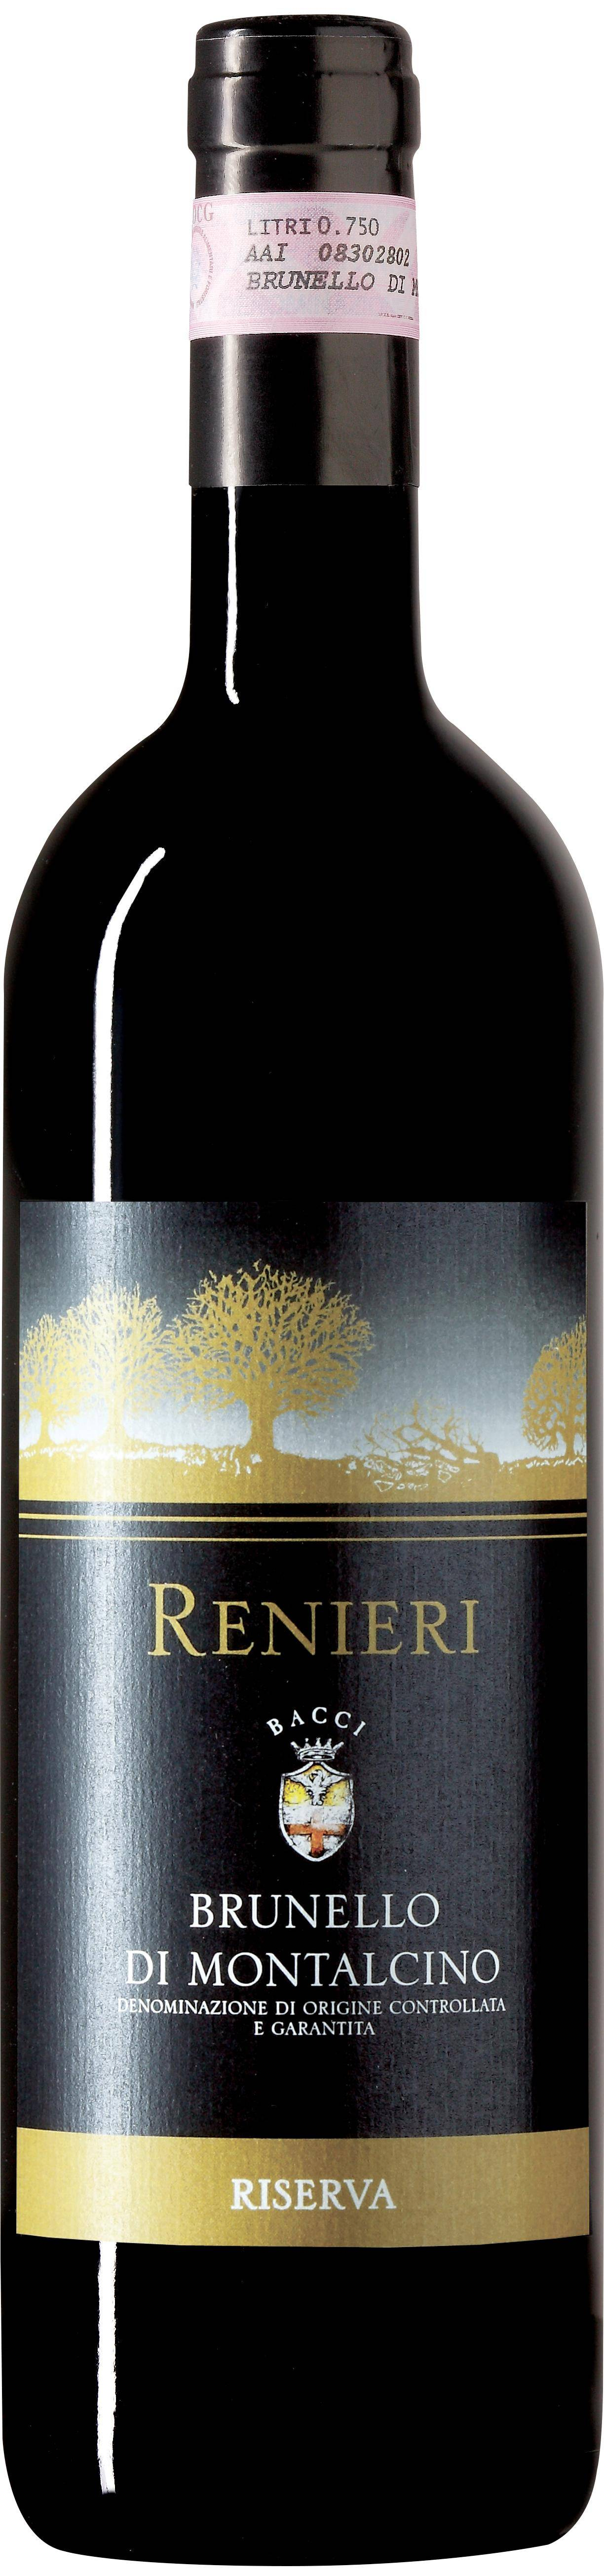 Вино брунелло ди монтальчино (brunello di montalcino): краткое описание, особенности и технология производства